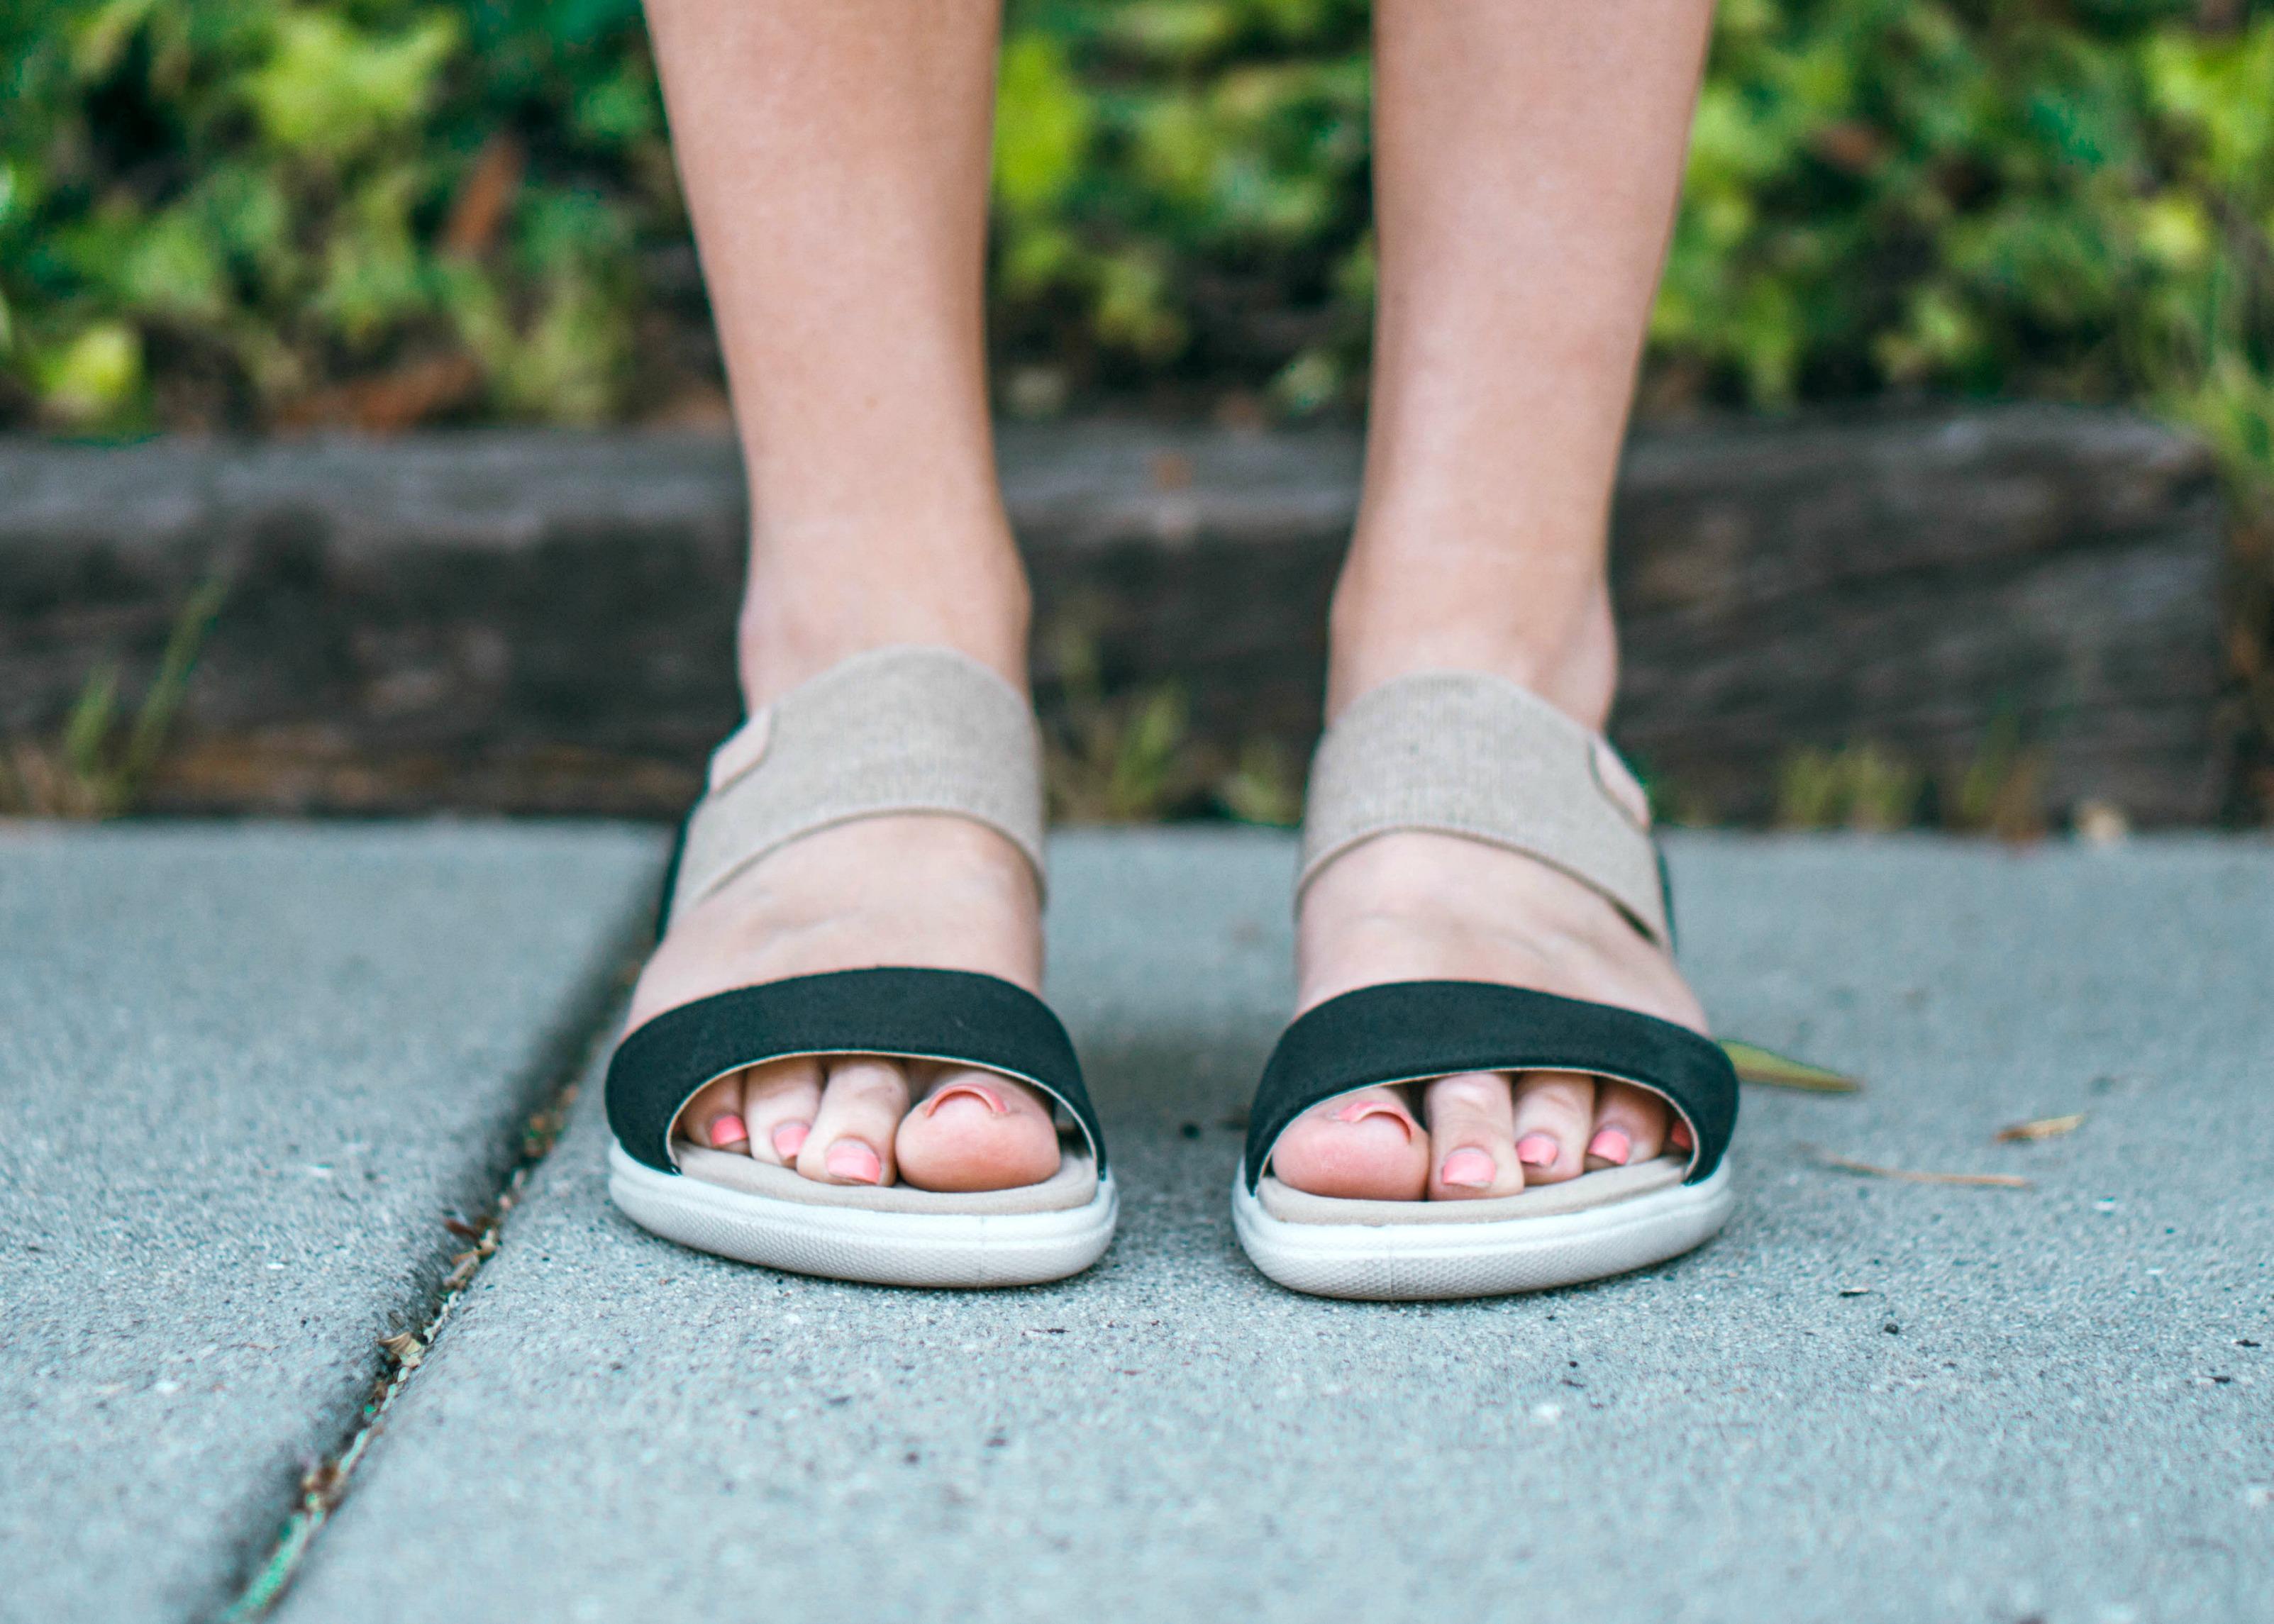 db14b002597 Even before wearing these Ecco Damara Ankle Gladiator Sandal